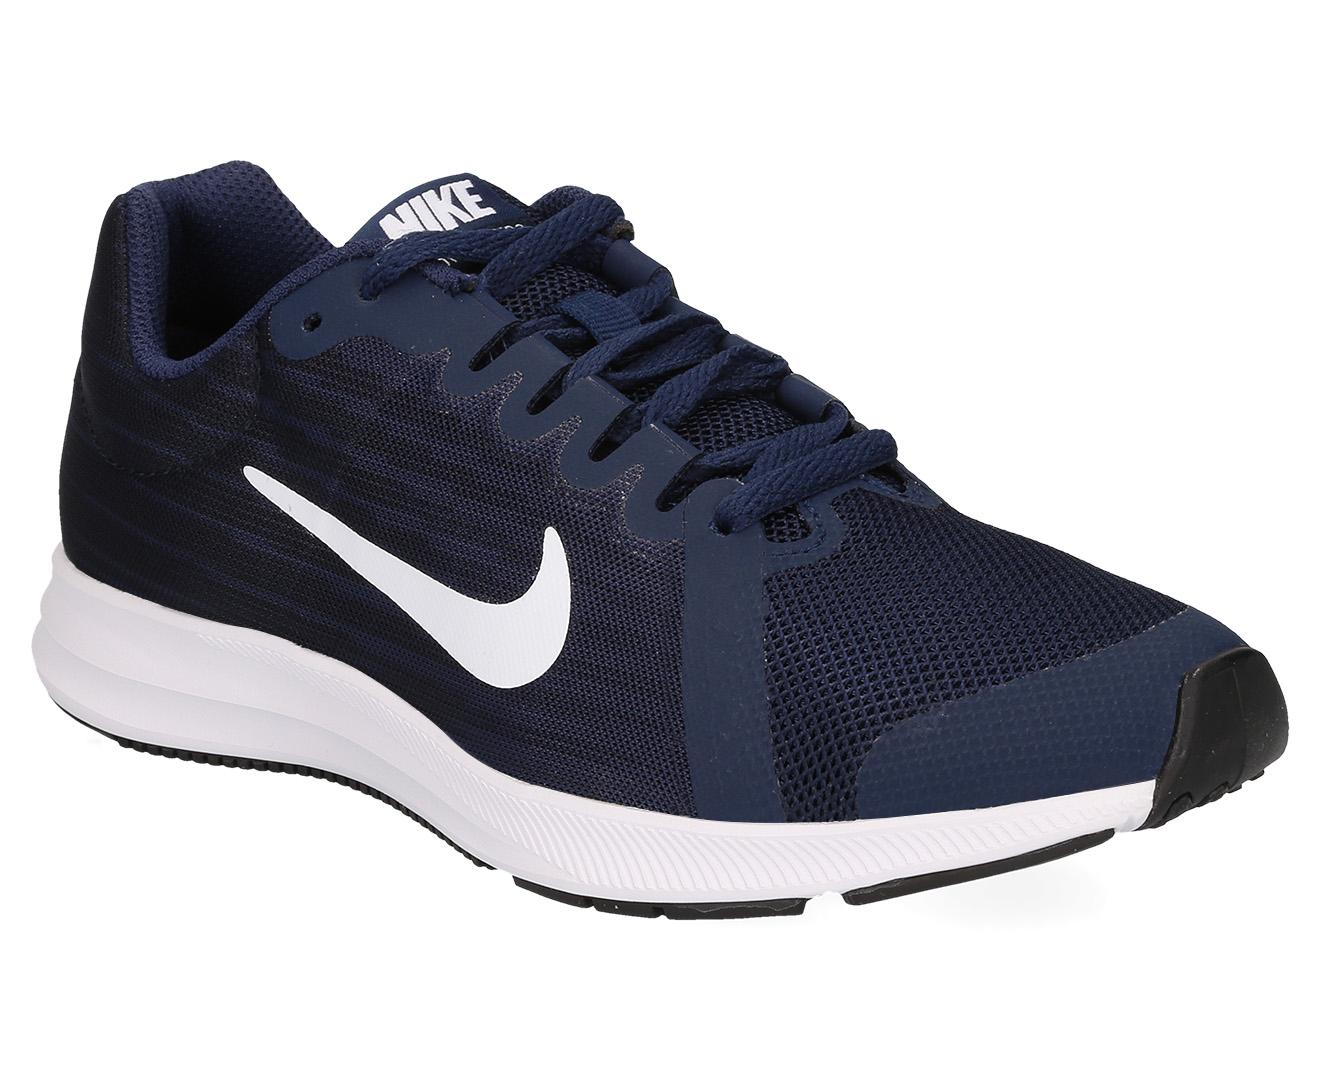 3a062540fbc Nike Grade-School Boys  Downshifter 8 Shoe - Midnight Navy White ...